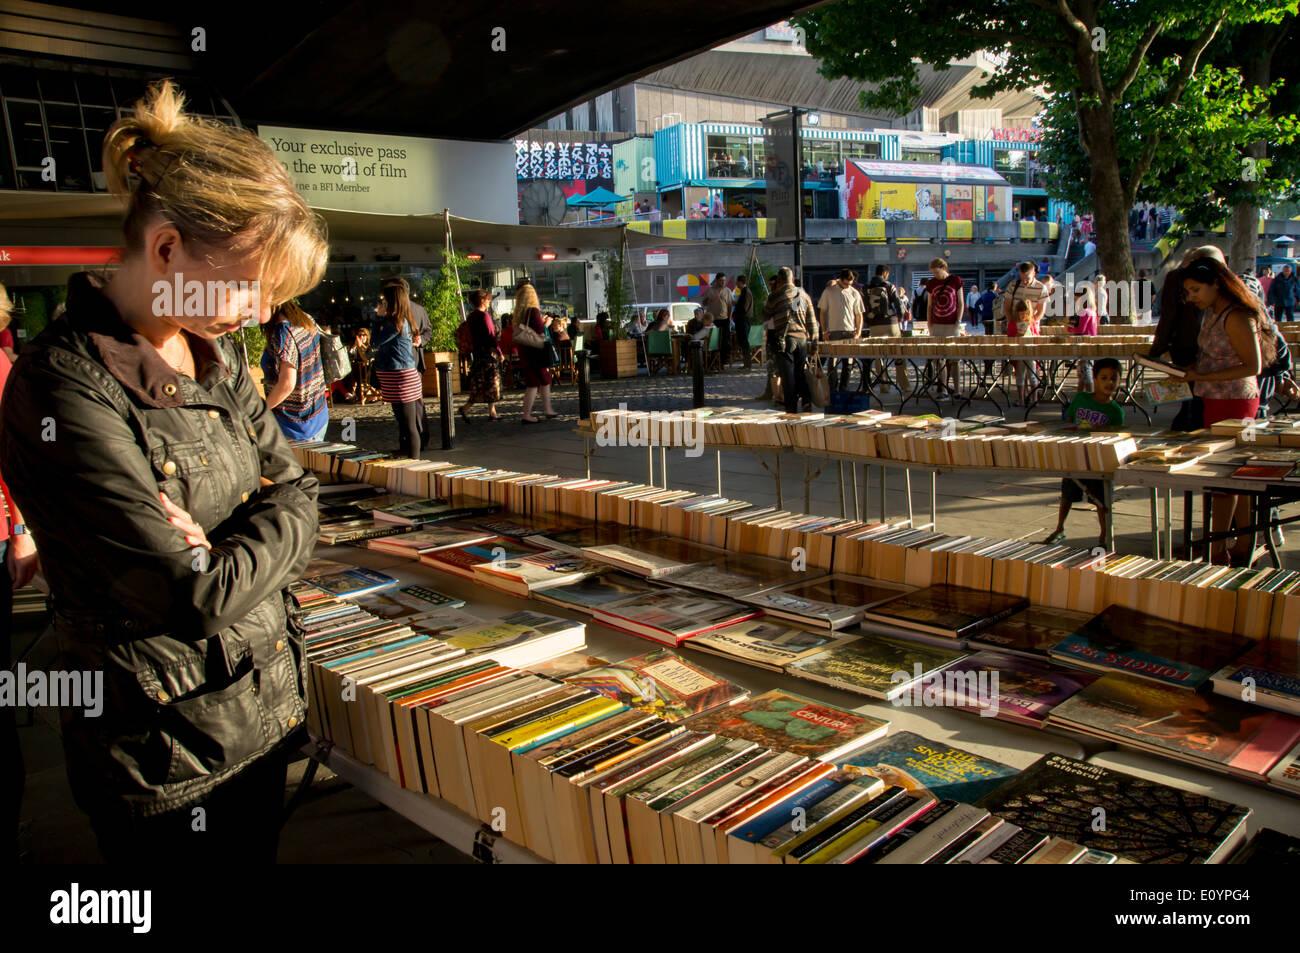 europe, UK, England, London, Southbank secondhand book stalls - Stock Image